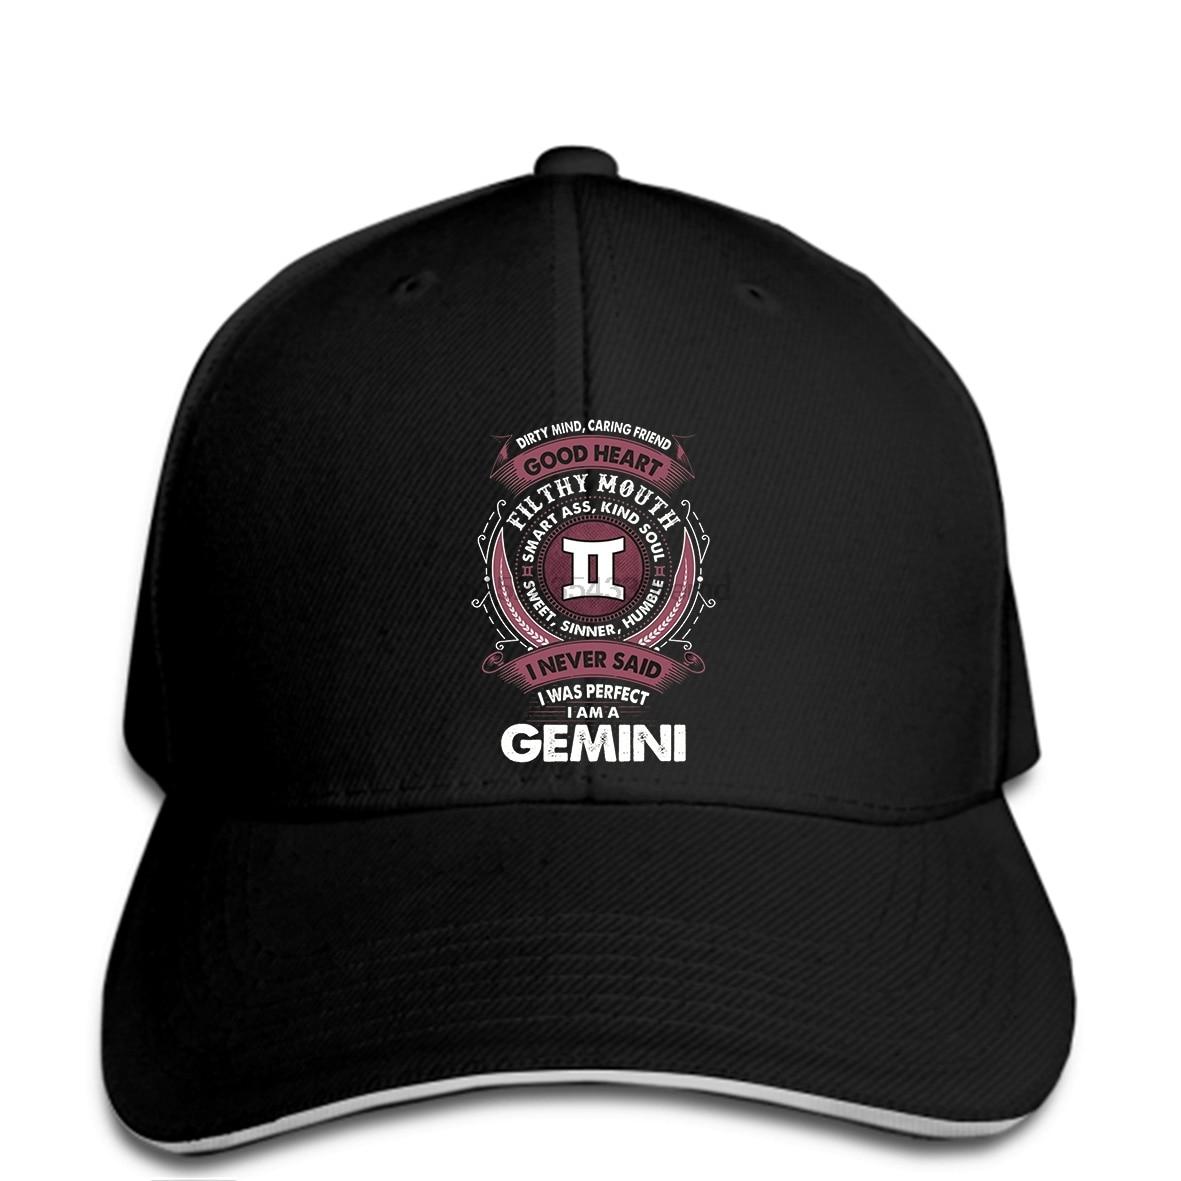 Us 99 Hip Hop Baseball Caps Funny Men Hat Cap Black Astrology Zodiac Signs Quote Gemini Womens Cap Black In Mens Baseball Caps From Apparel